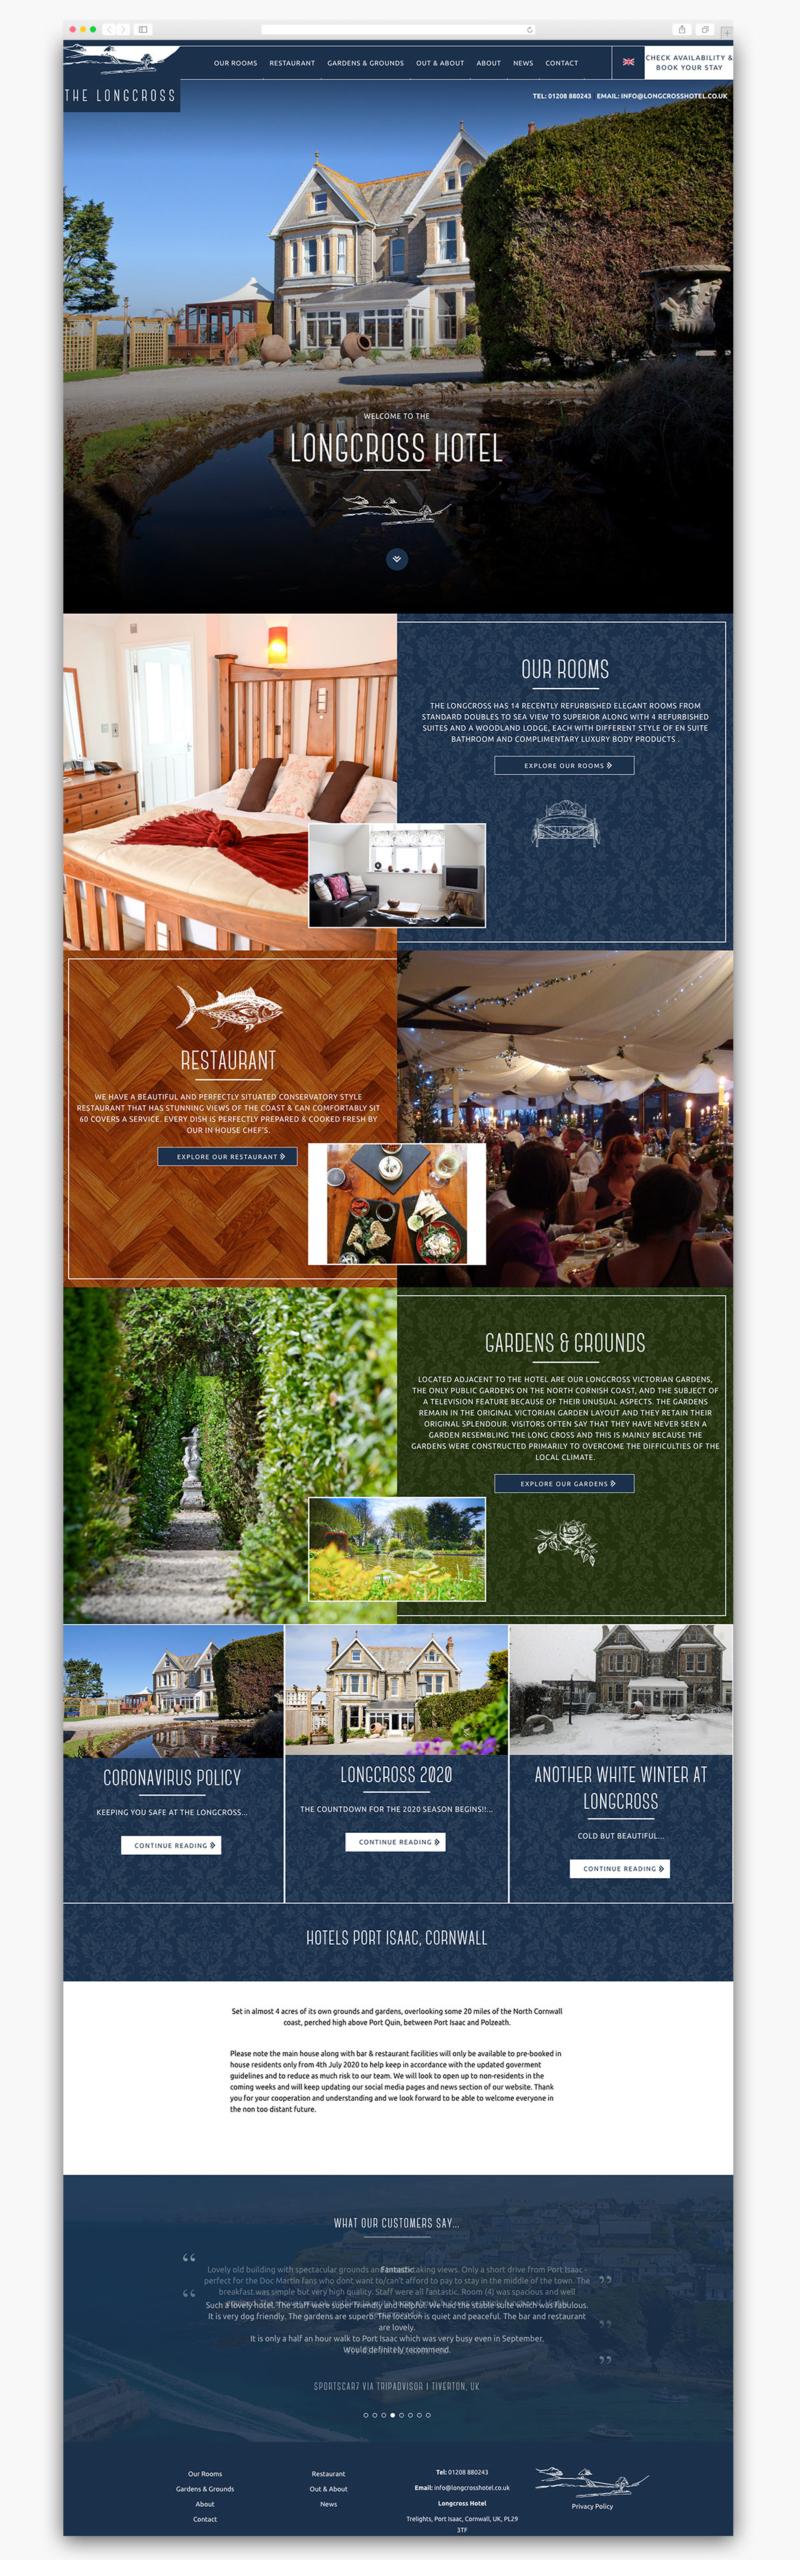 Longcross Hotel Homepage Website Design